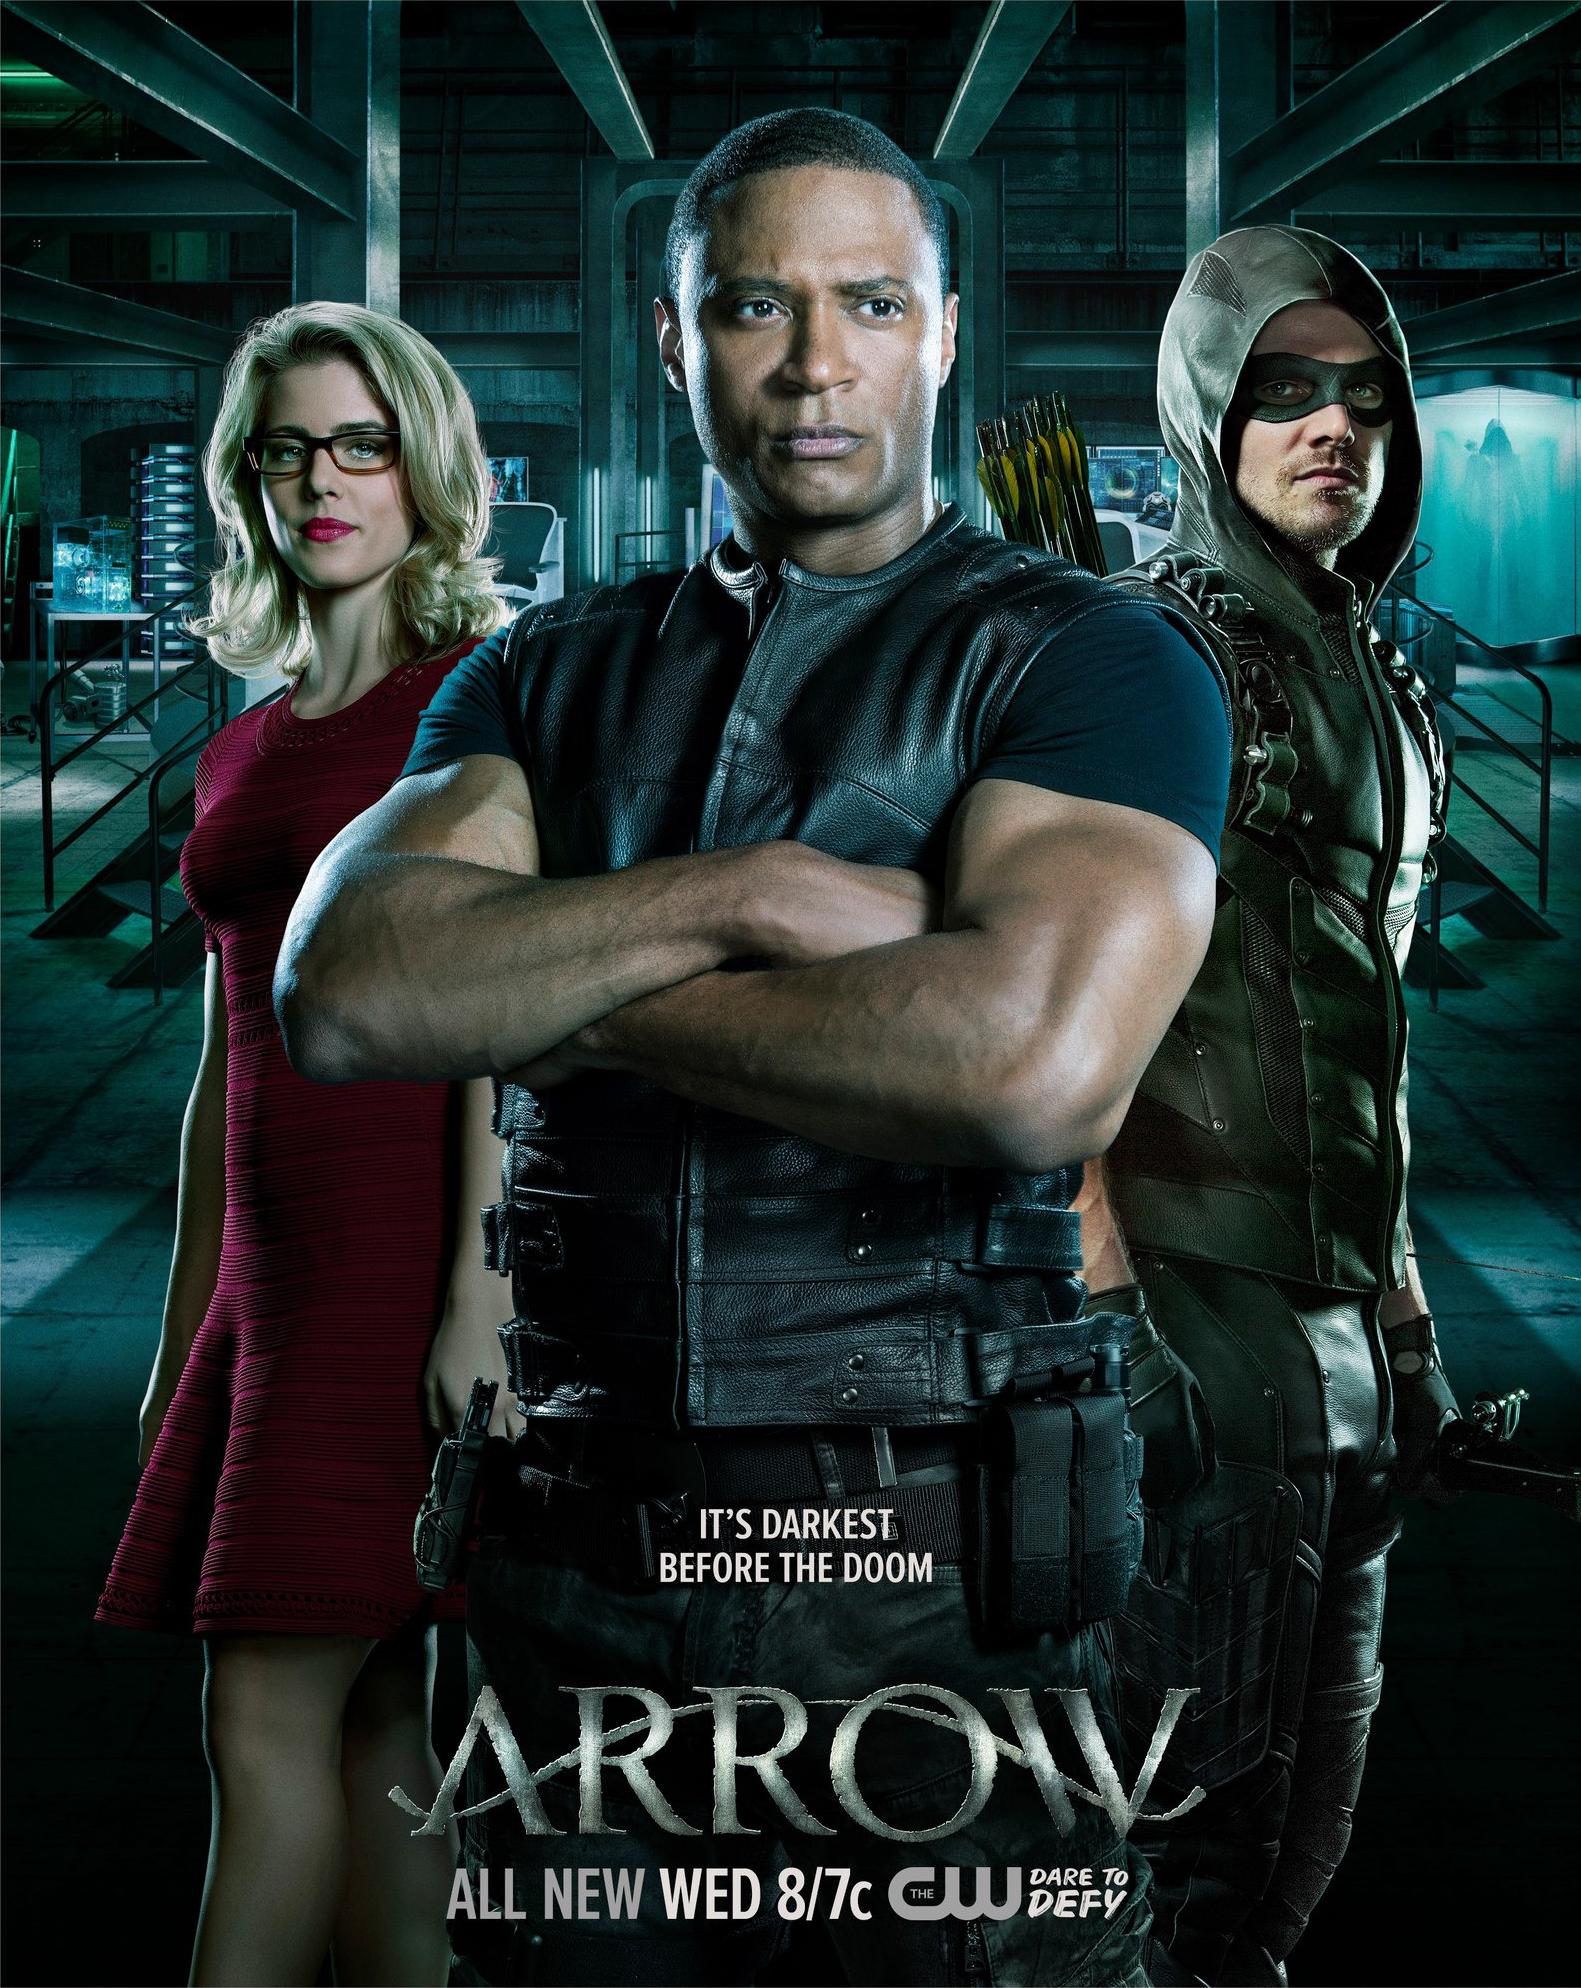 Arrow season 4 poster - It's Darkest Before the Doom.png